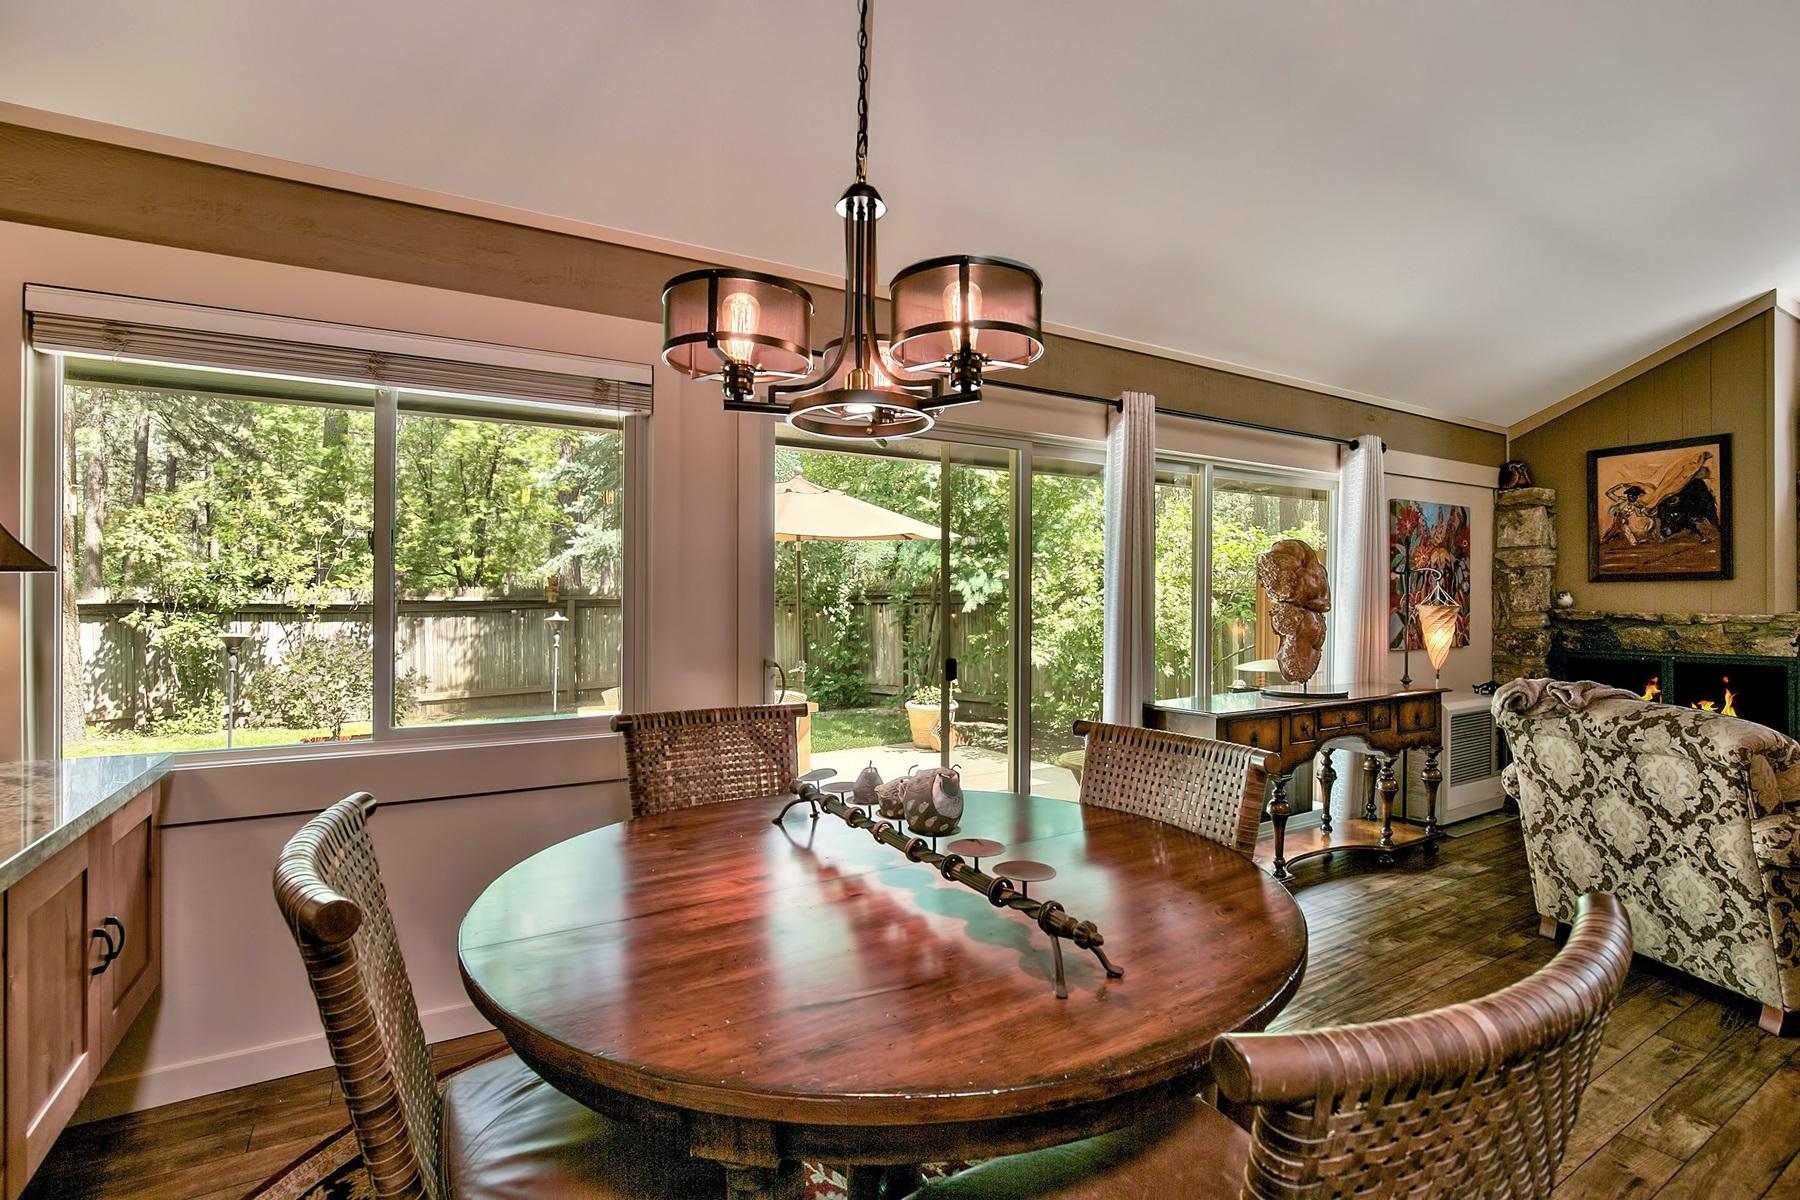 Additional photo for property listing at 87 Graeagle Meadows Road  Graeagle, California 96103 Estados Unidos